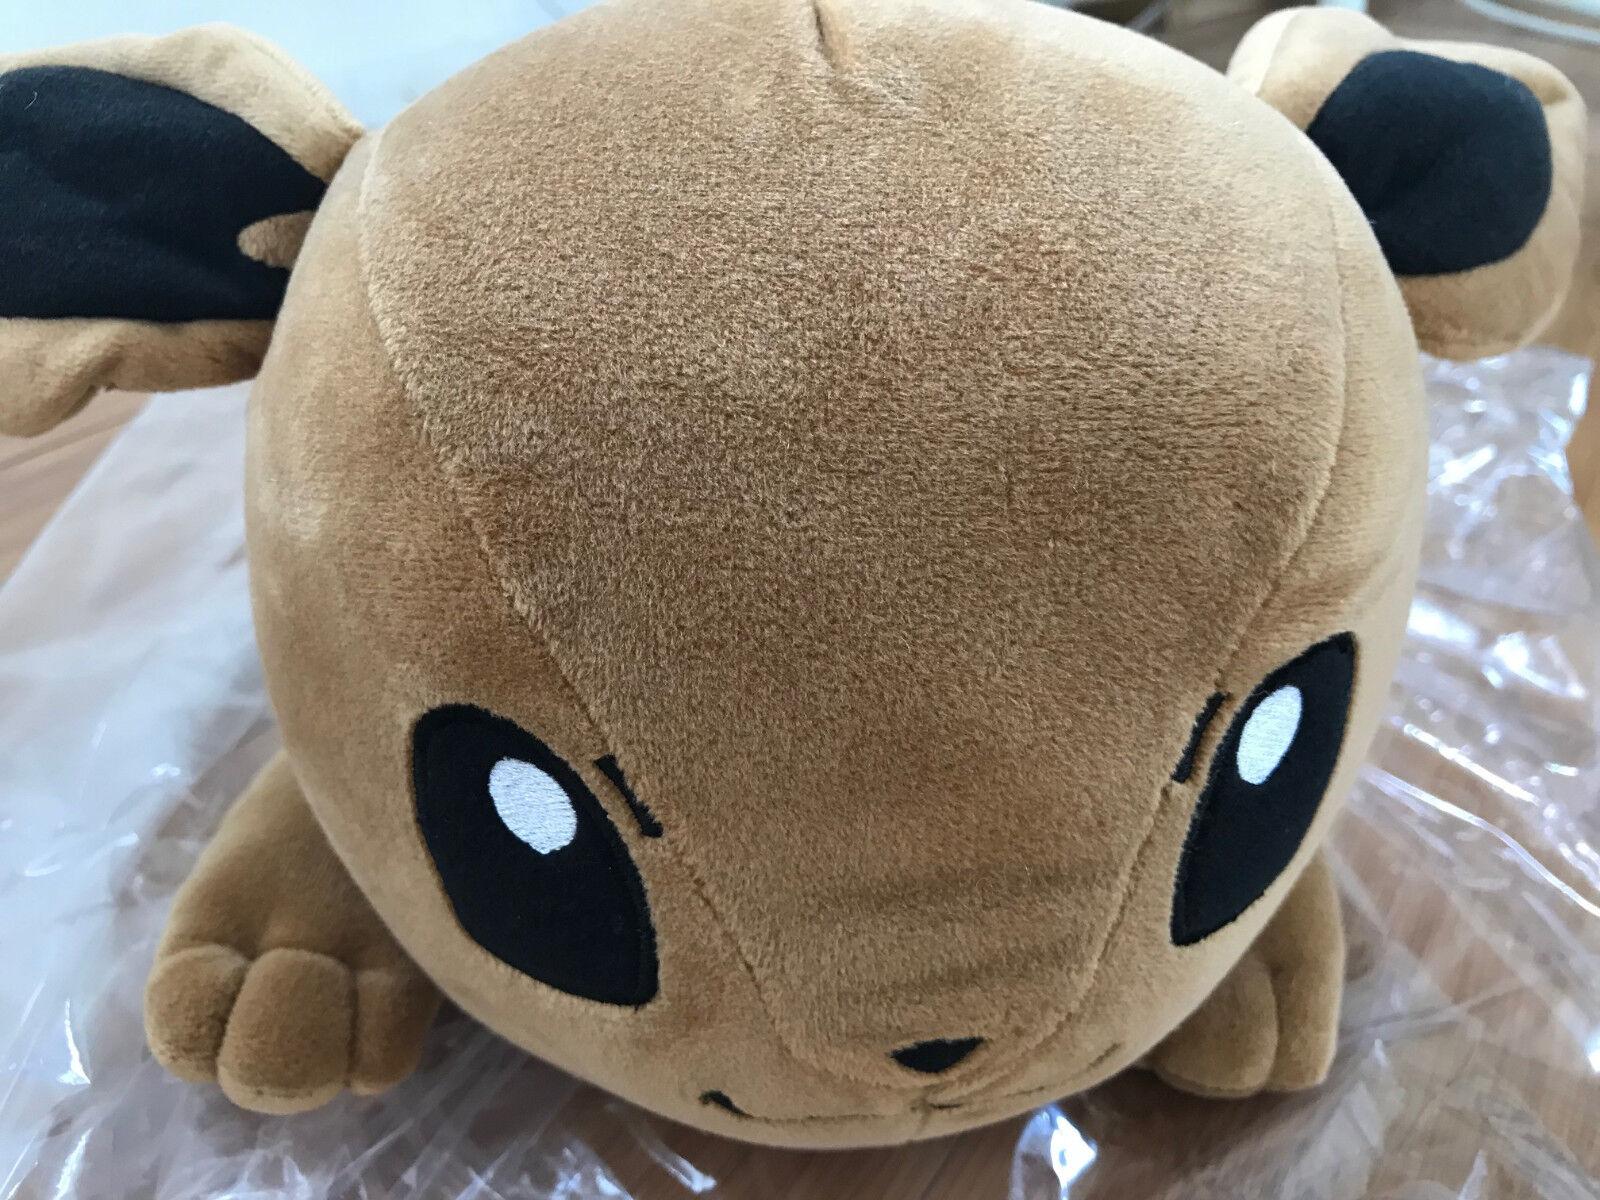 Pokemon Banpresto Eevee DX 2006 Plush New With Tag